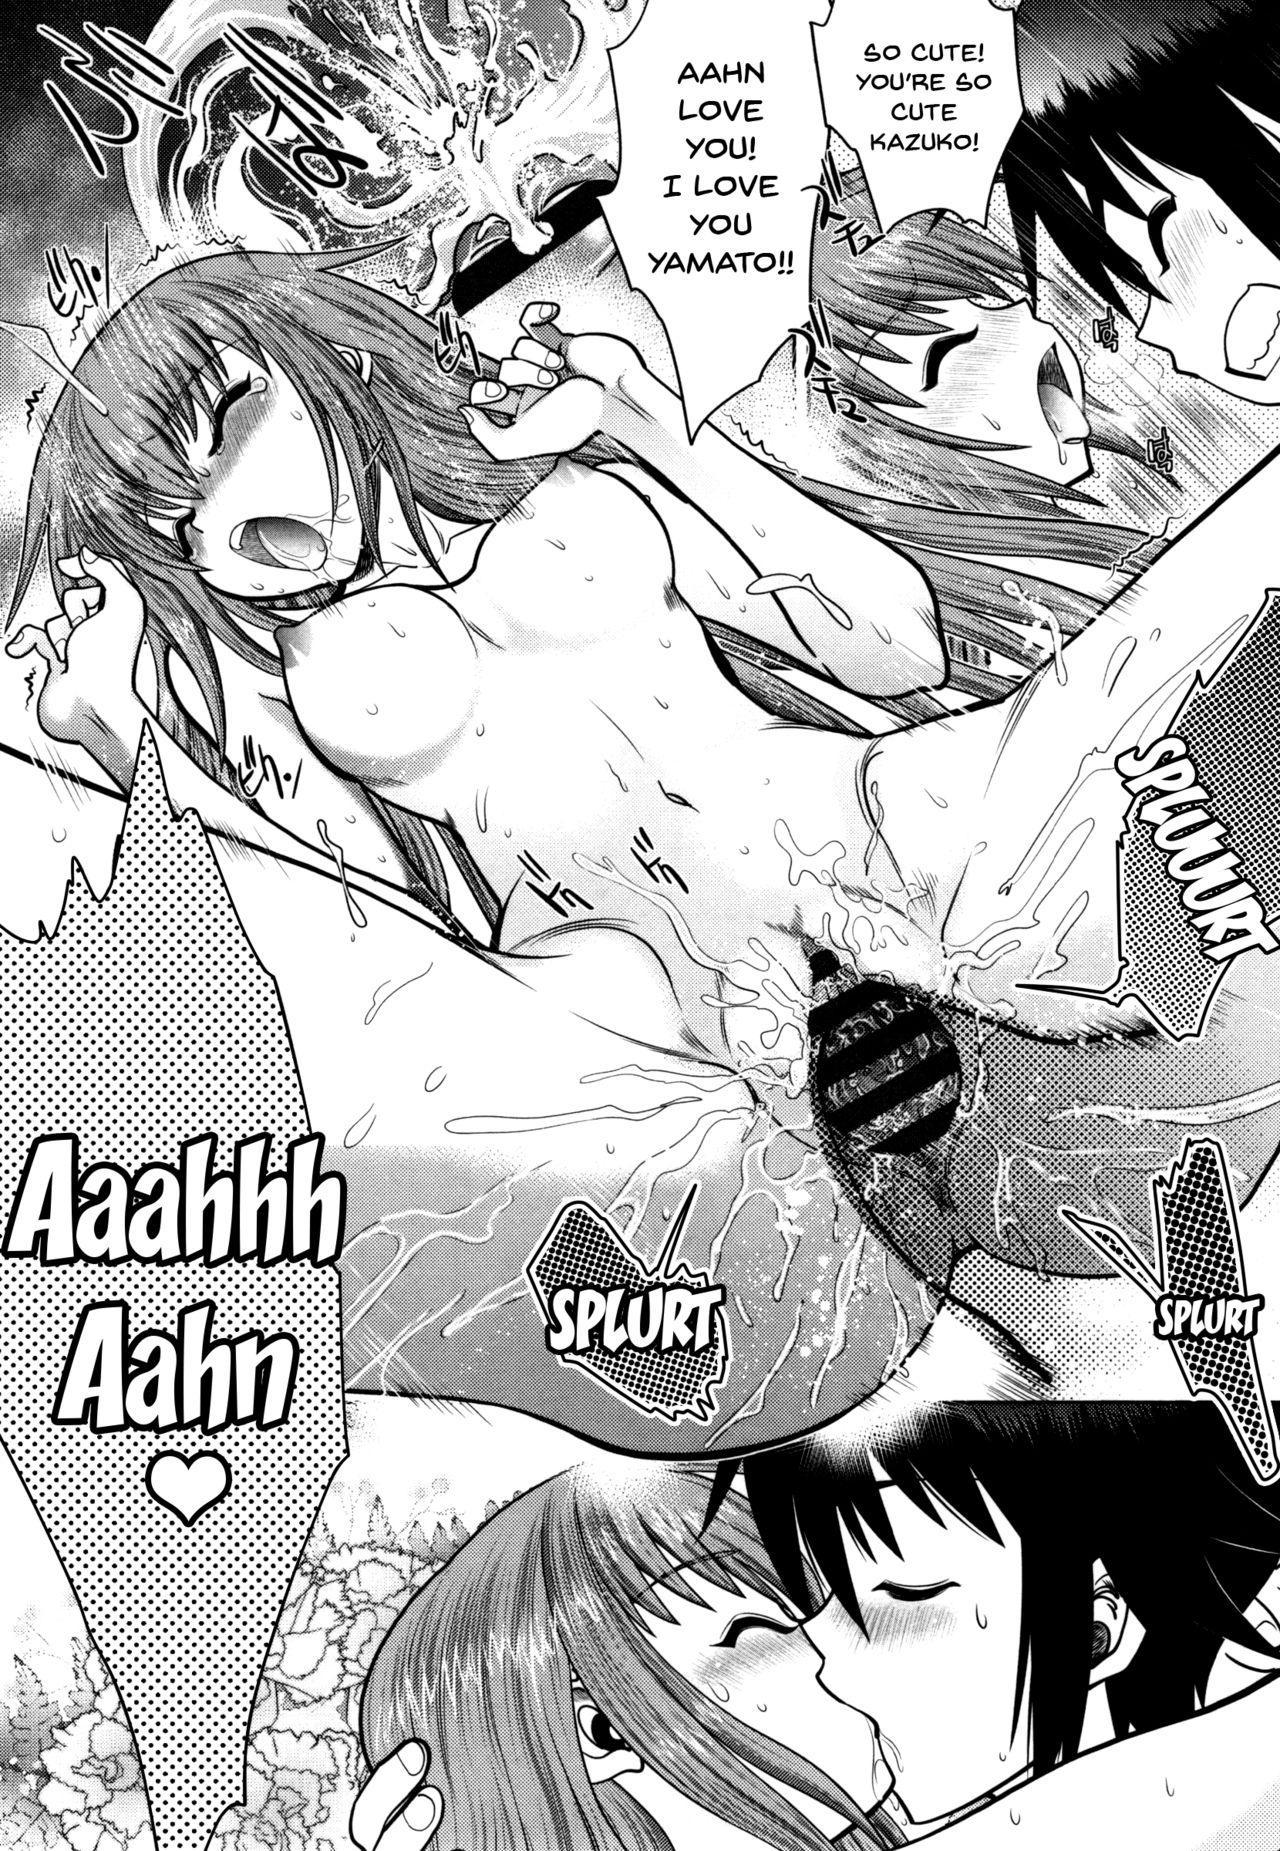 [Yagami Dai] Maji de Watashi ni Koi Shinasai! S Adult Edition ~Shodai Heroine Hen~ | Fall in Love With Me For Real! Ch.1-8 [English] {Doujins.com} 83